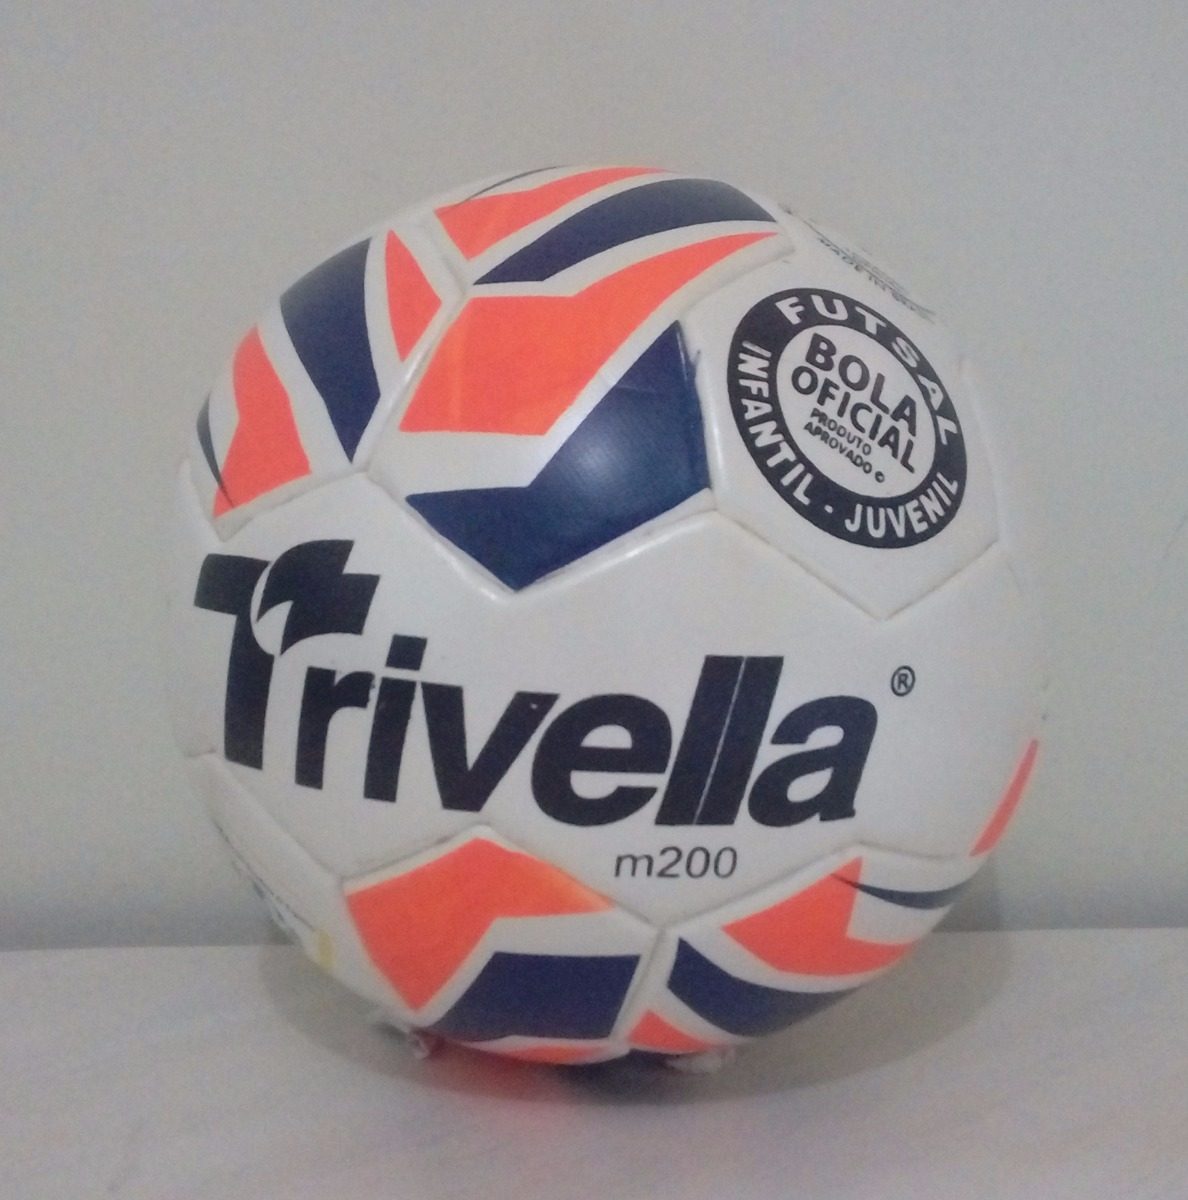 9d9b2816c3 kit 2 bolas de futsal max 200 infantil trivella brasil gold. Carregando zoom .